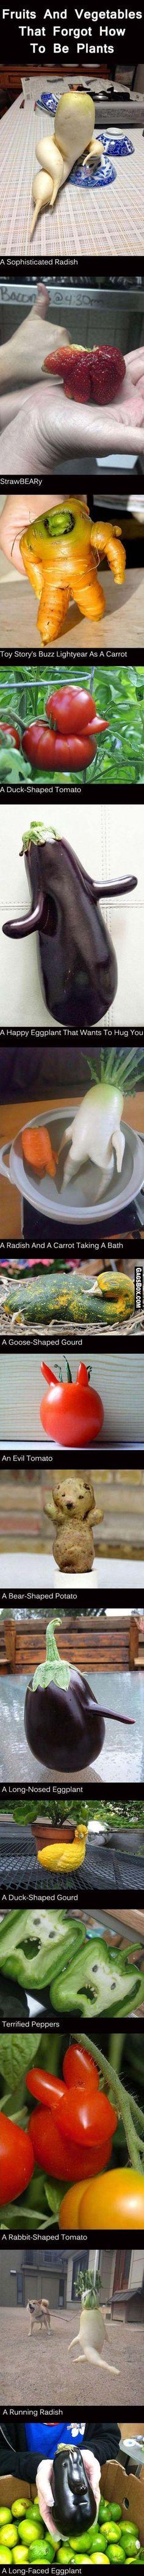 They Forgot How To Vegetable - #funny, #lol, #fun, #humor, #comics, #meme, #gag, #lolpics, #funnypics,